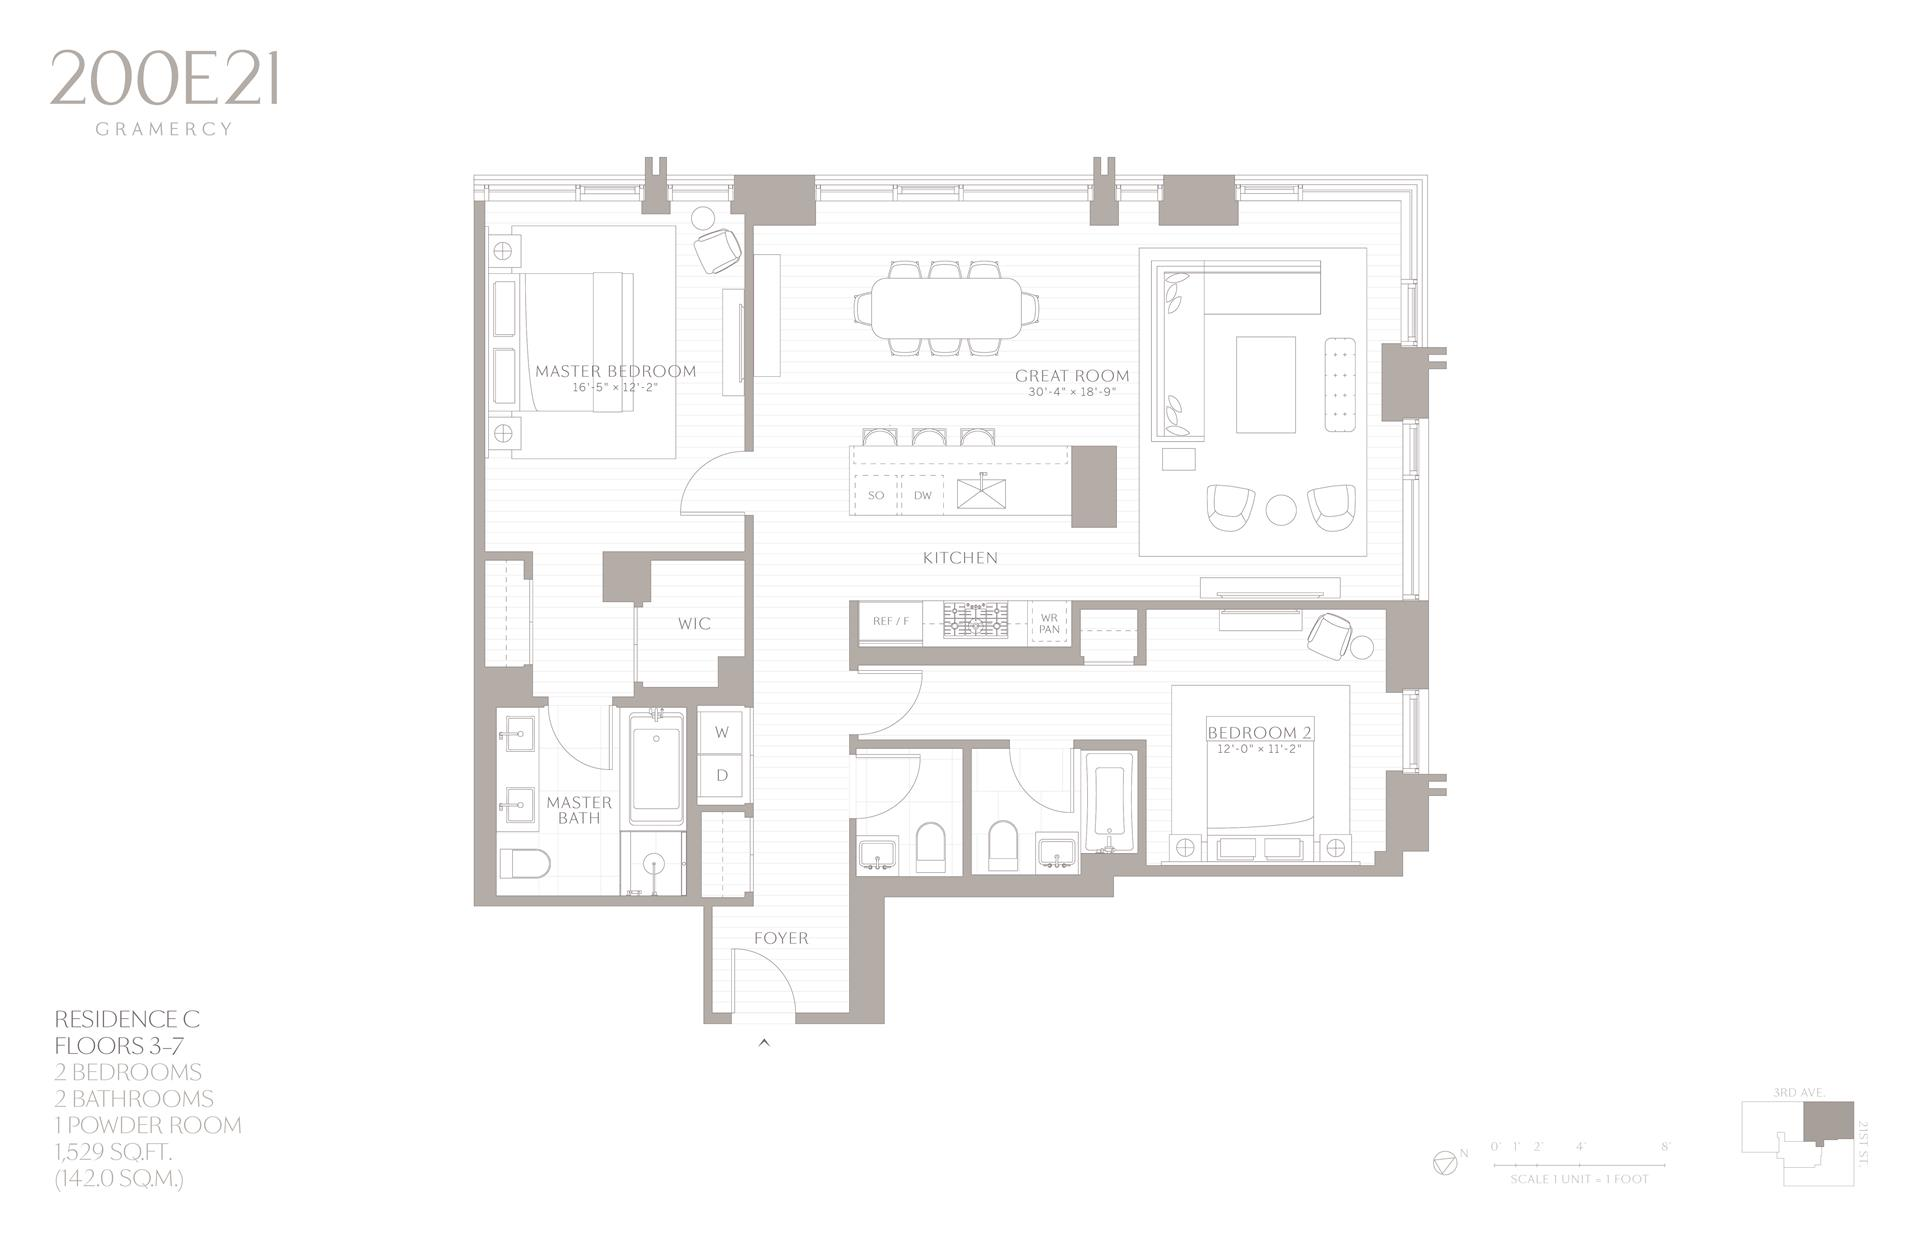 Floor plan of 200 East 21st St, 7C - Gramercy - Union Square, New York